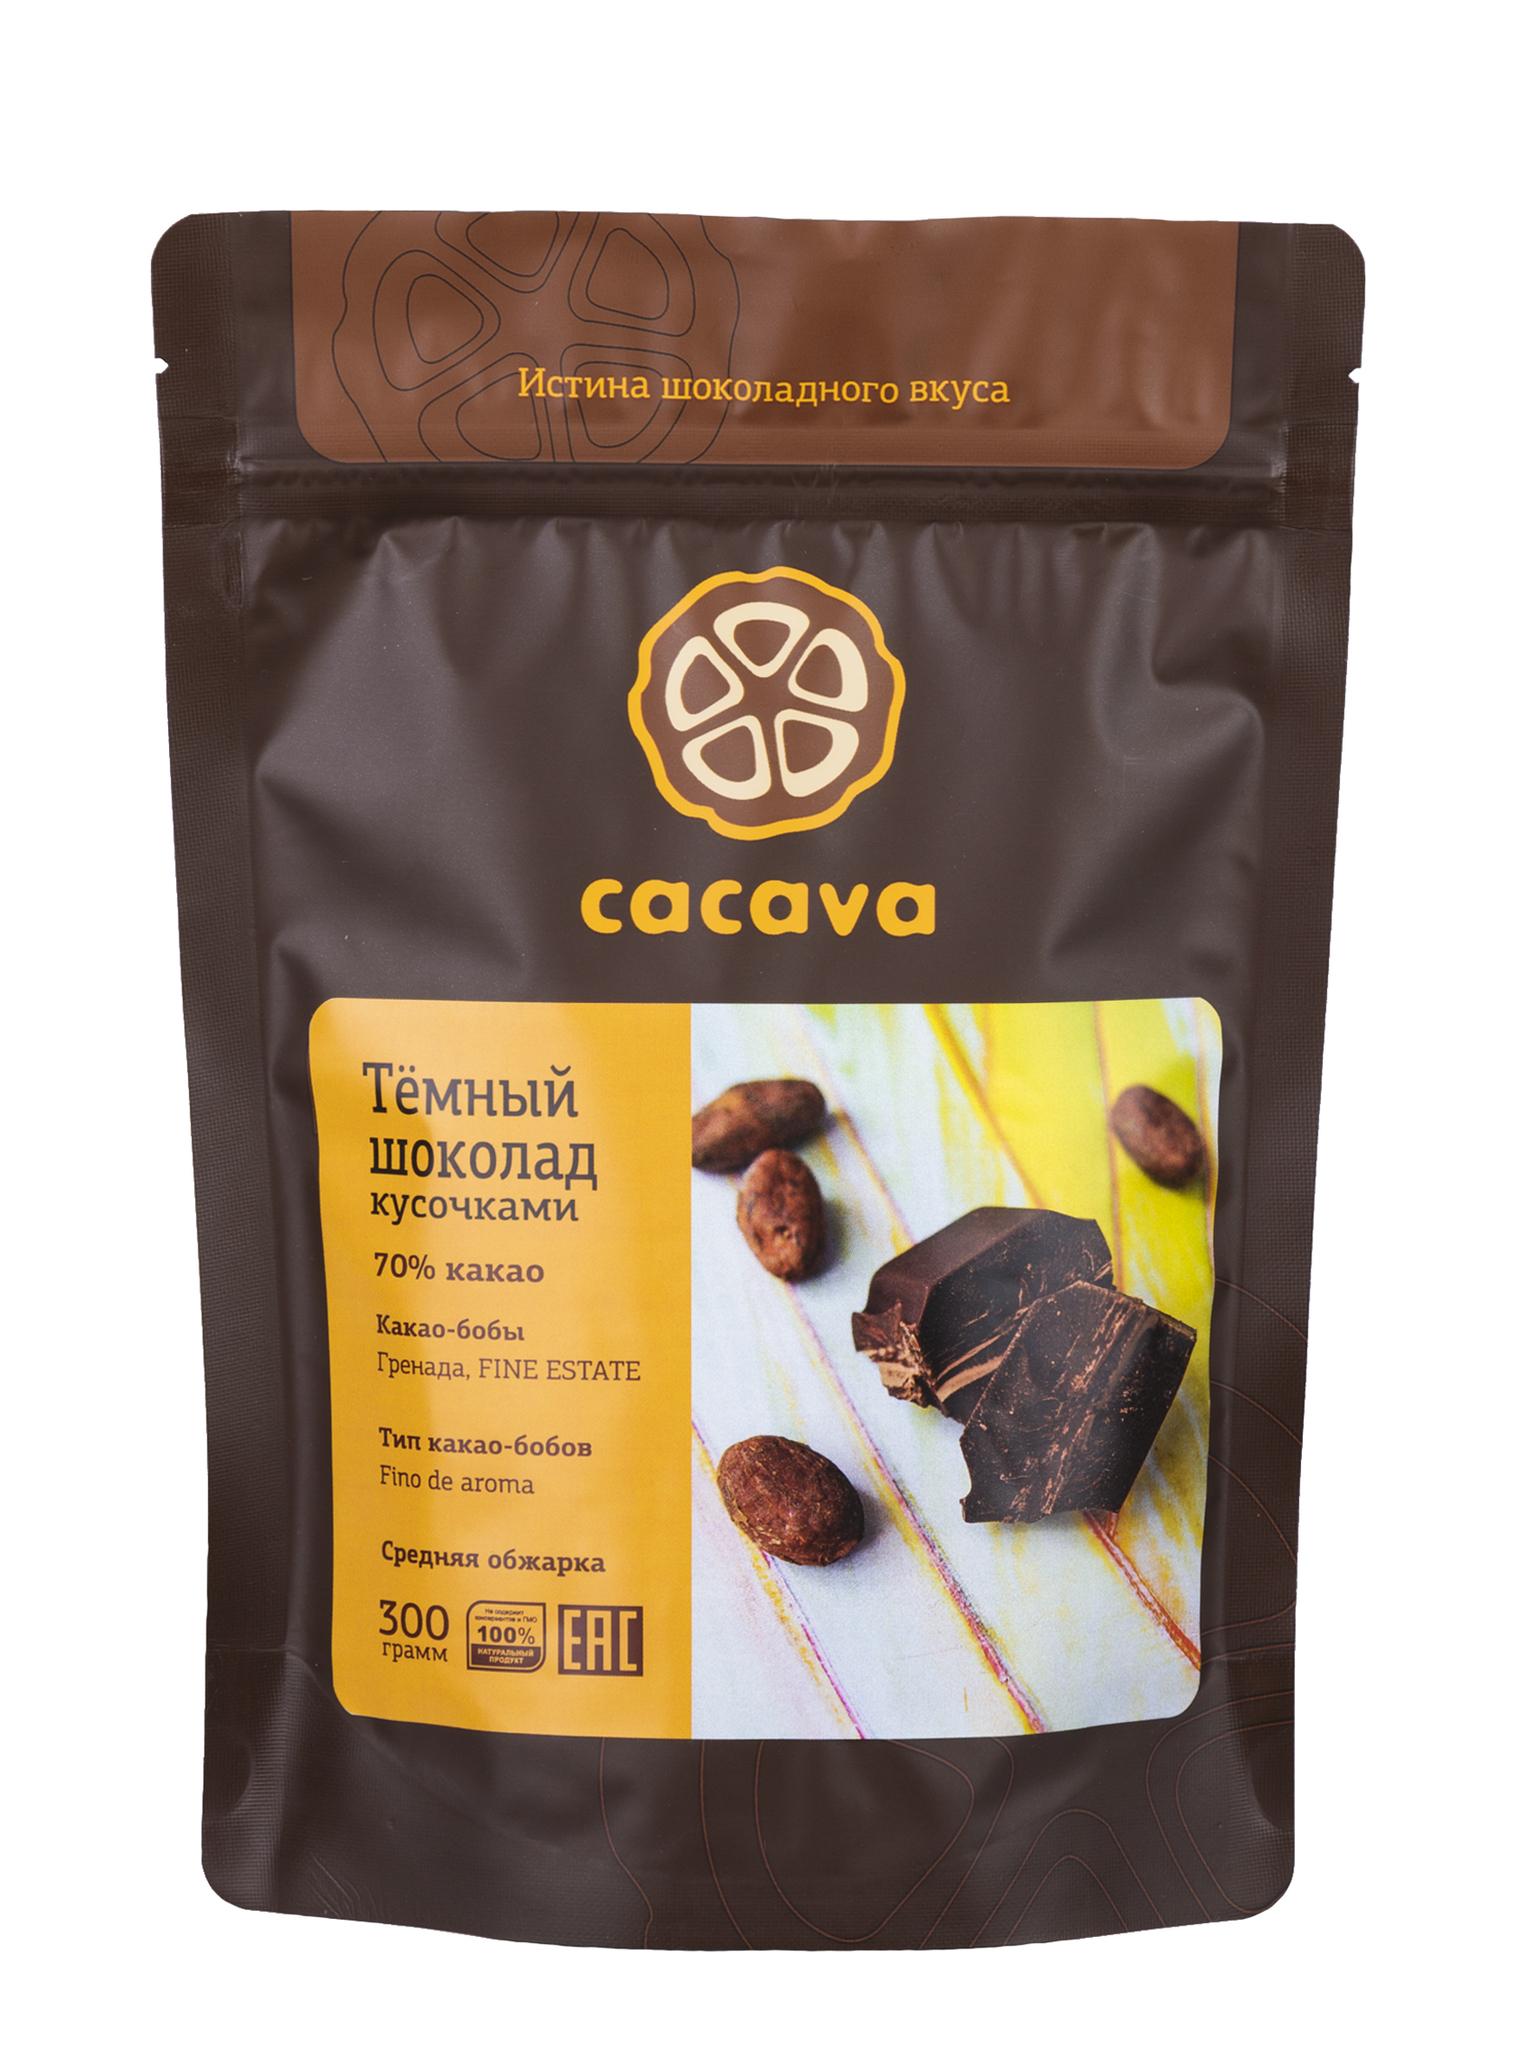 Тёмный шоколад 70 % какао (Гренада), упаковка 300 грамм